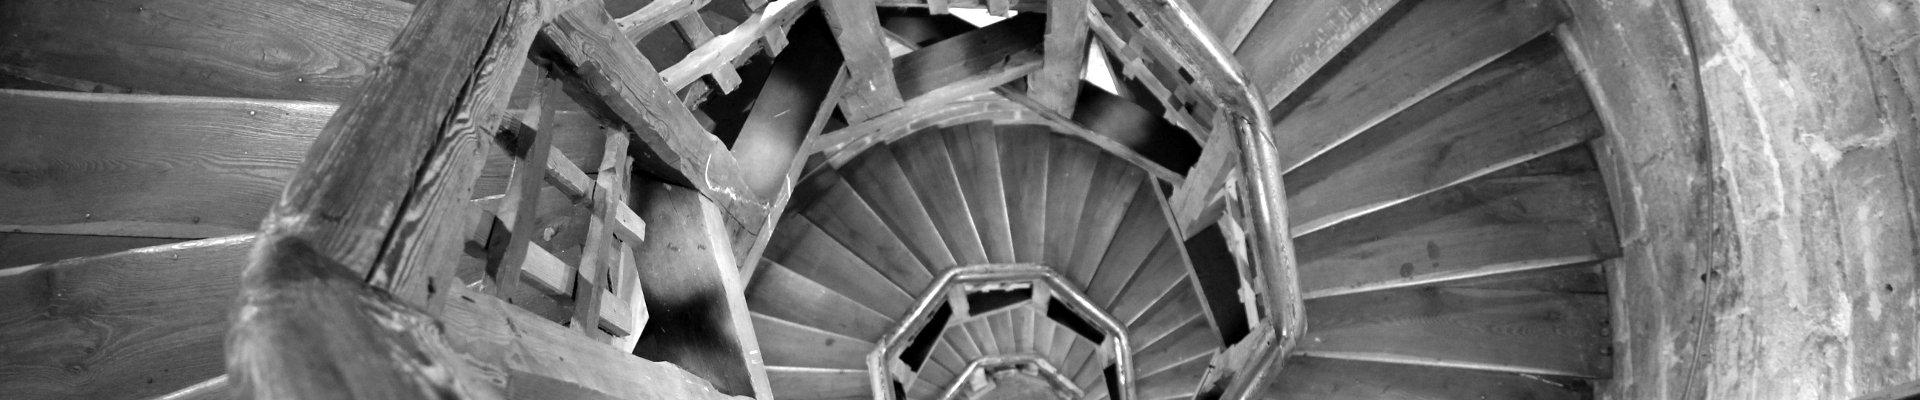 Escaliers de grenier